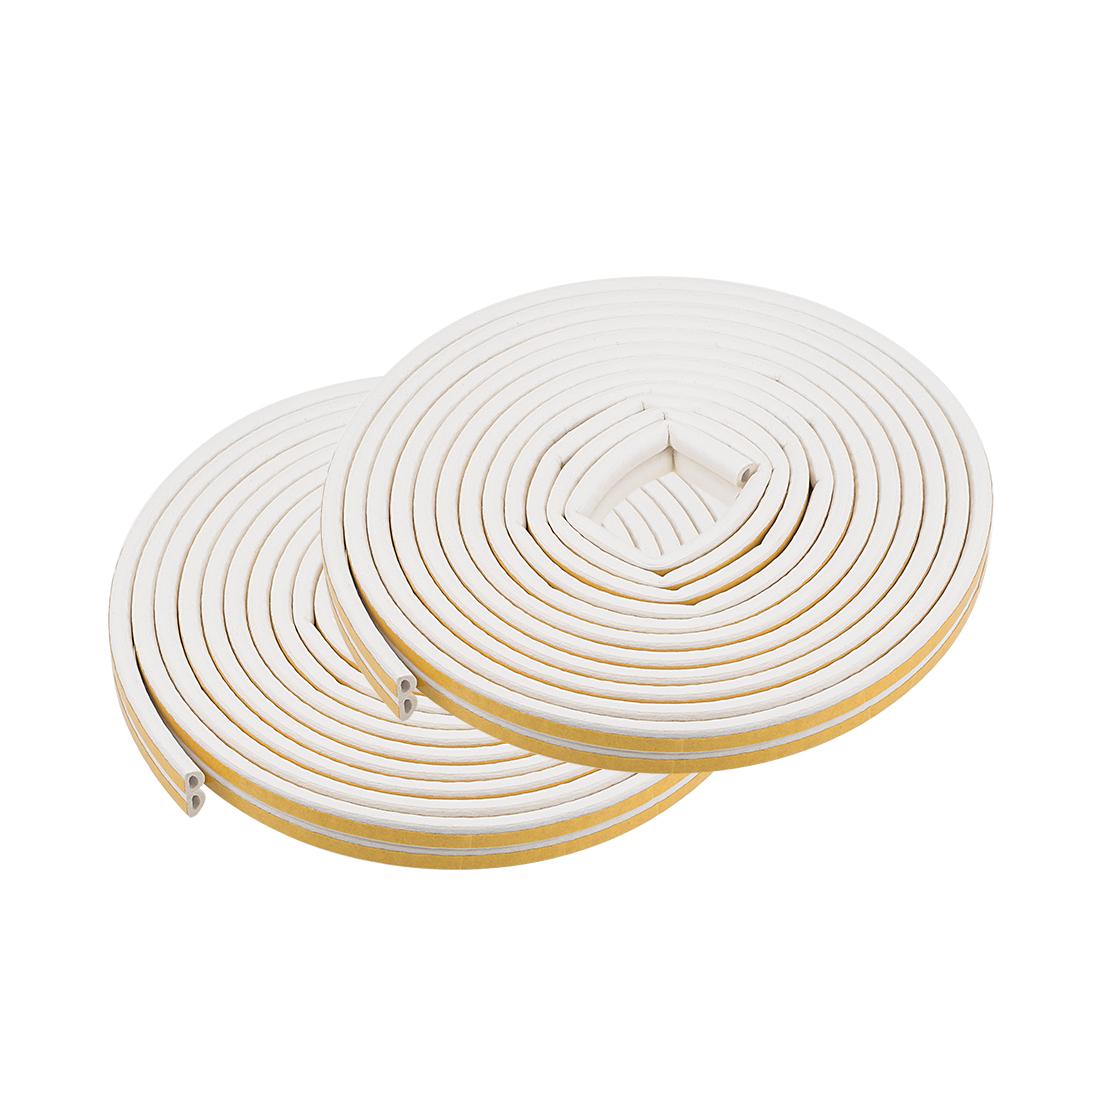 Foam Tape Self-Adhesive 9mm Width 6mm Thick, Total 65.6 Feet White 4Pcs